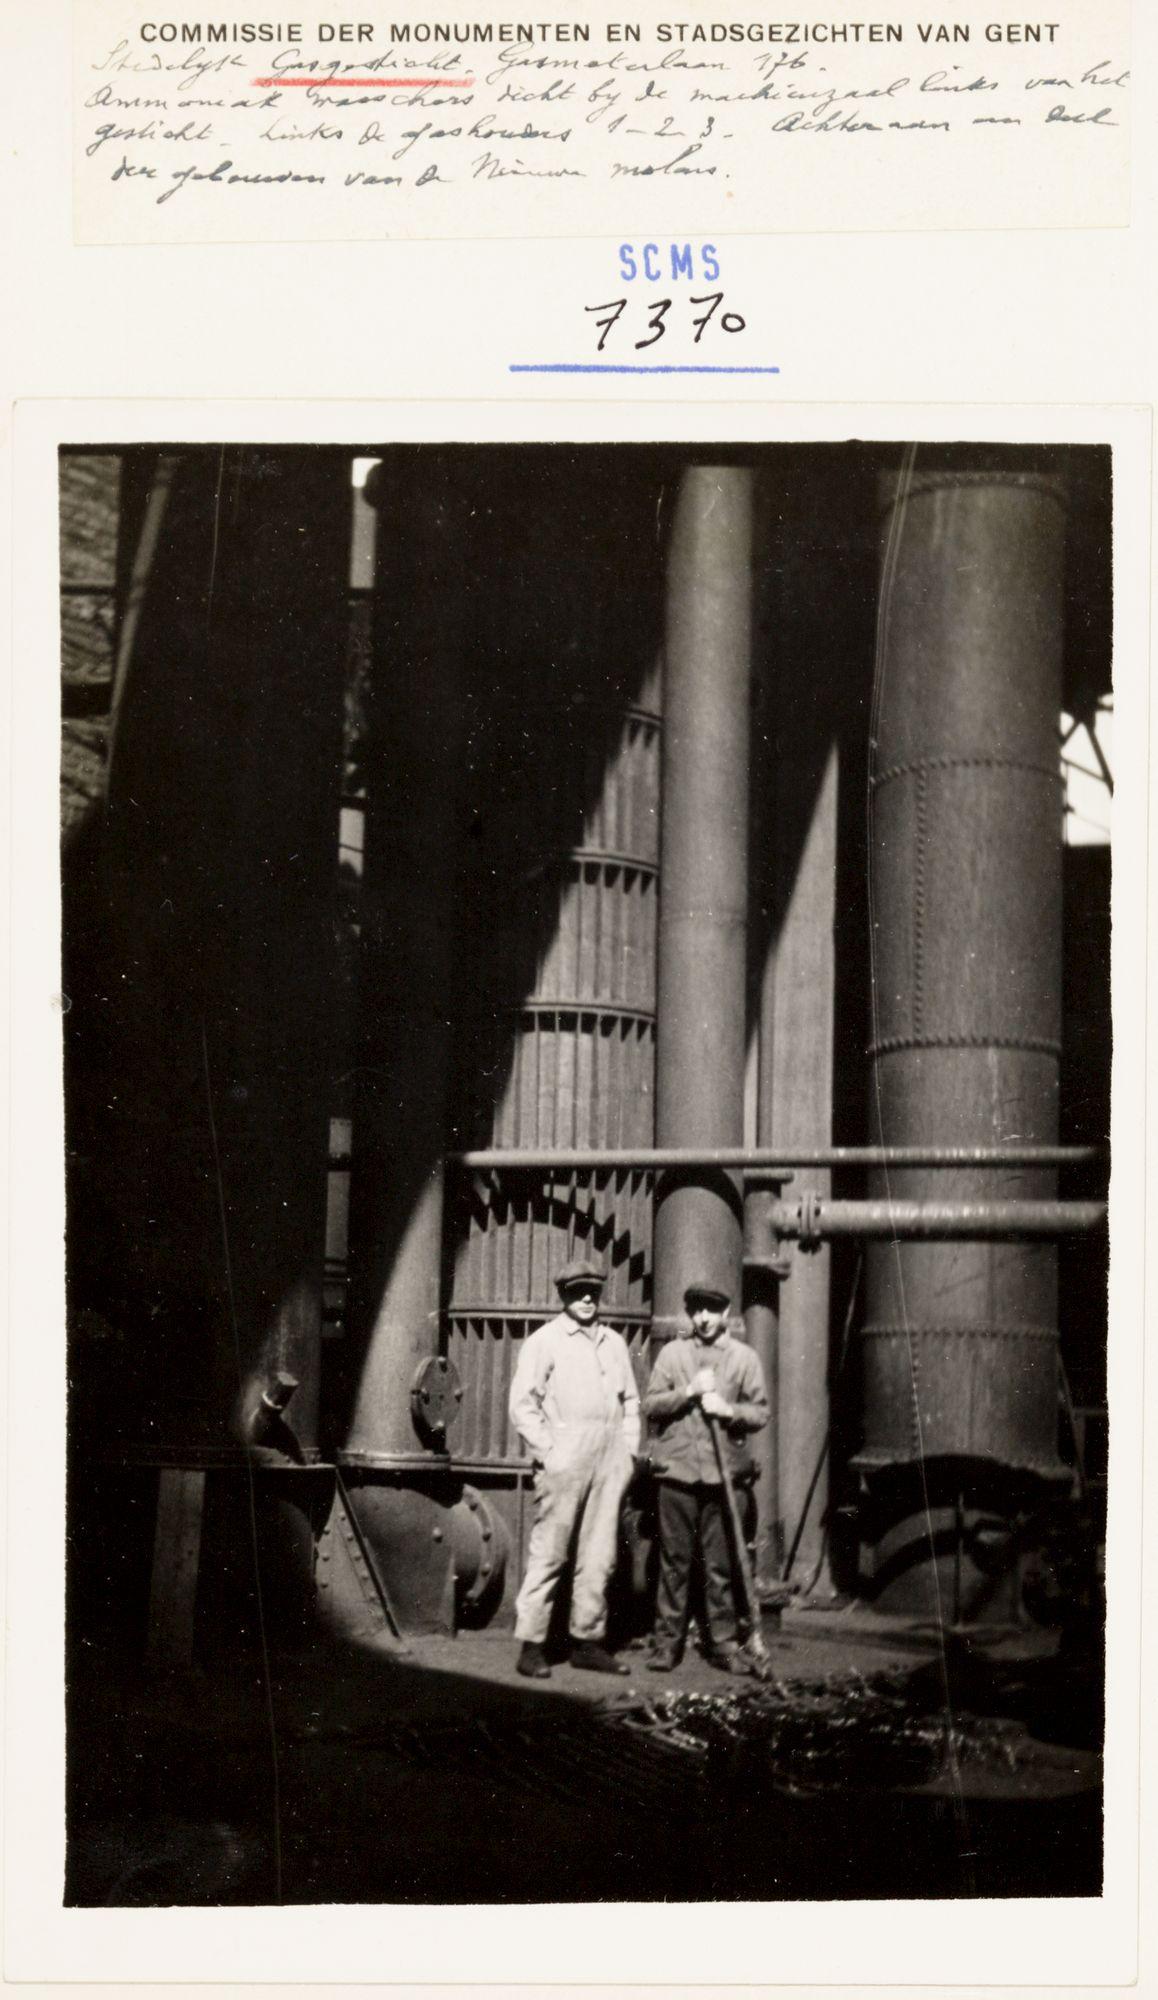 Gent: Stedelijke gasfabriek, Gasmeterlaan